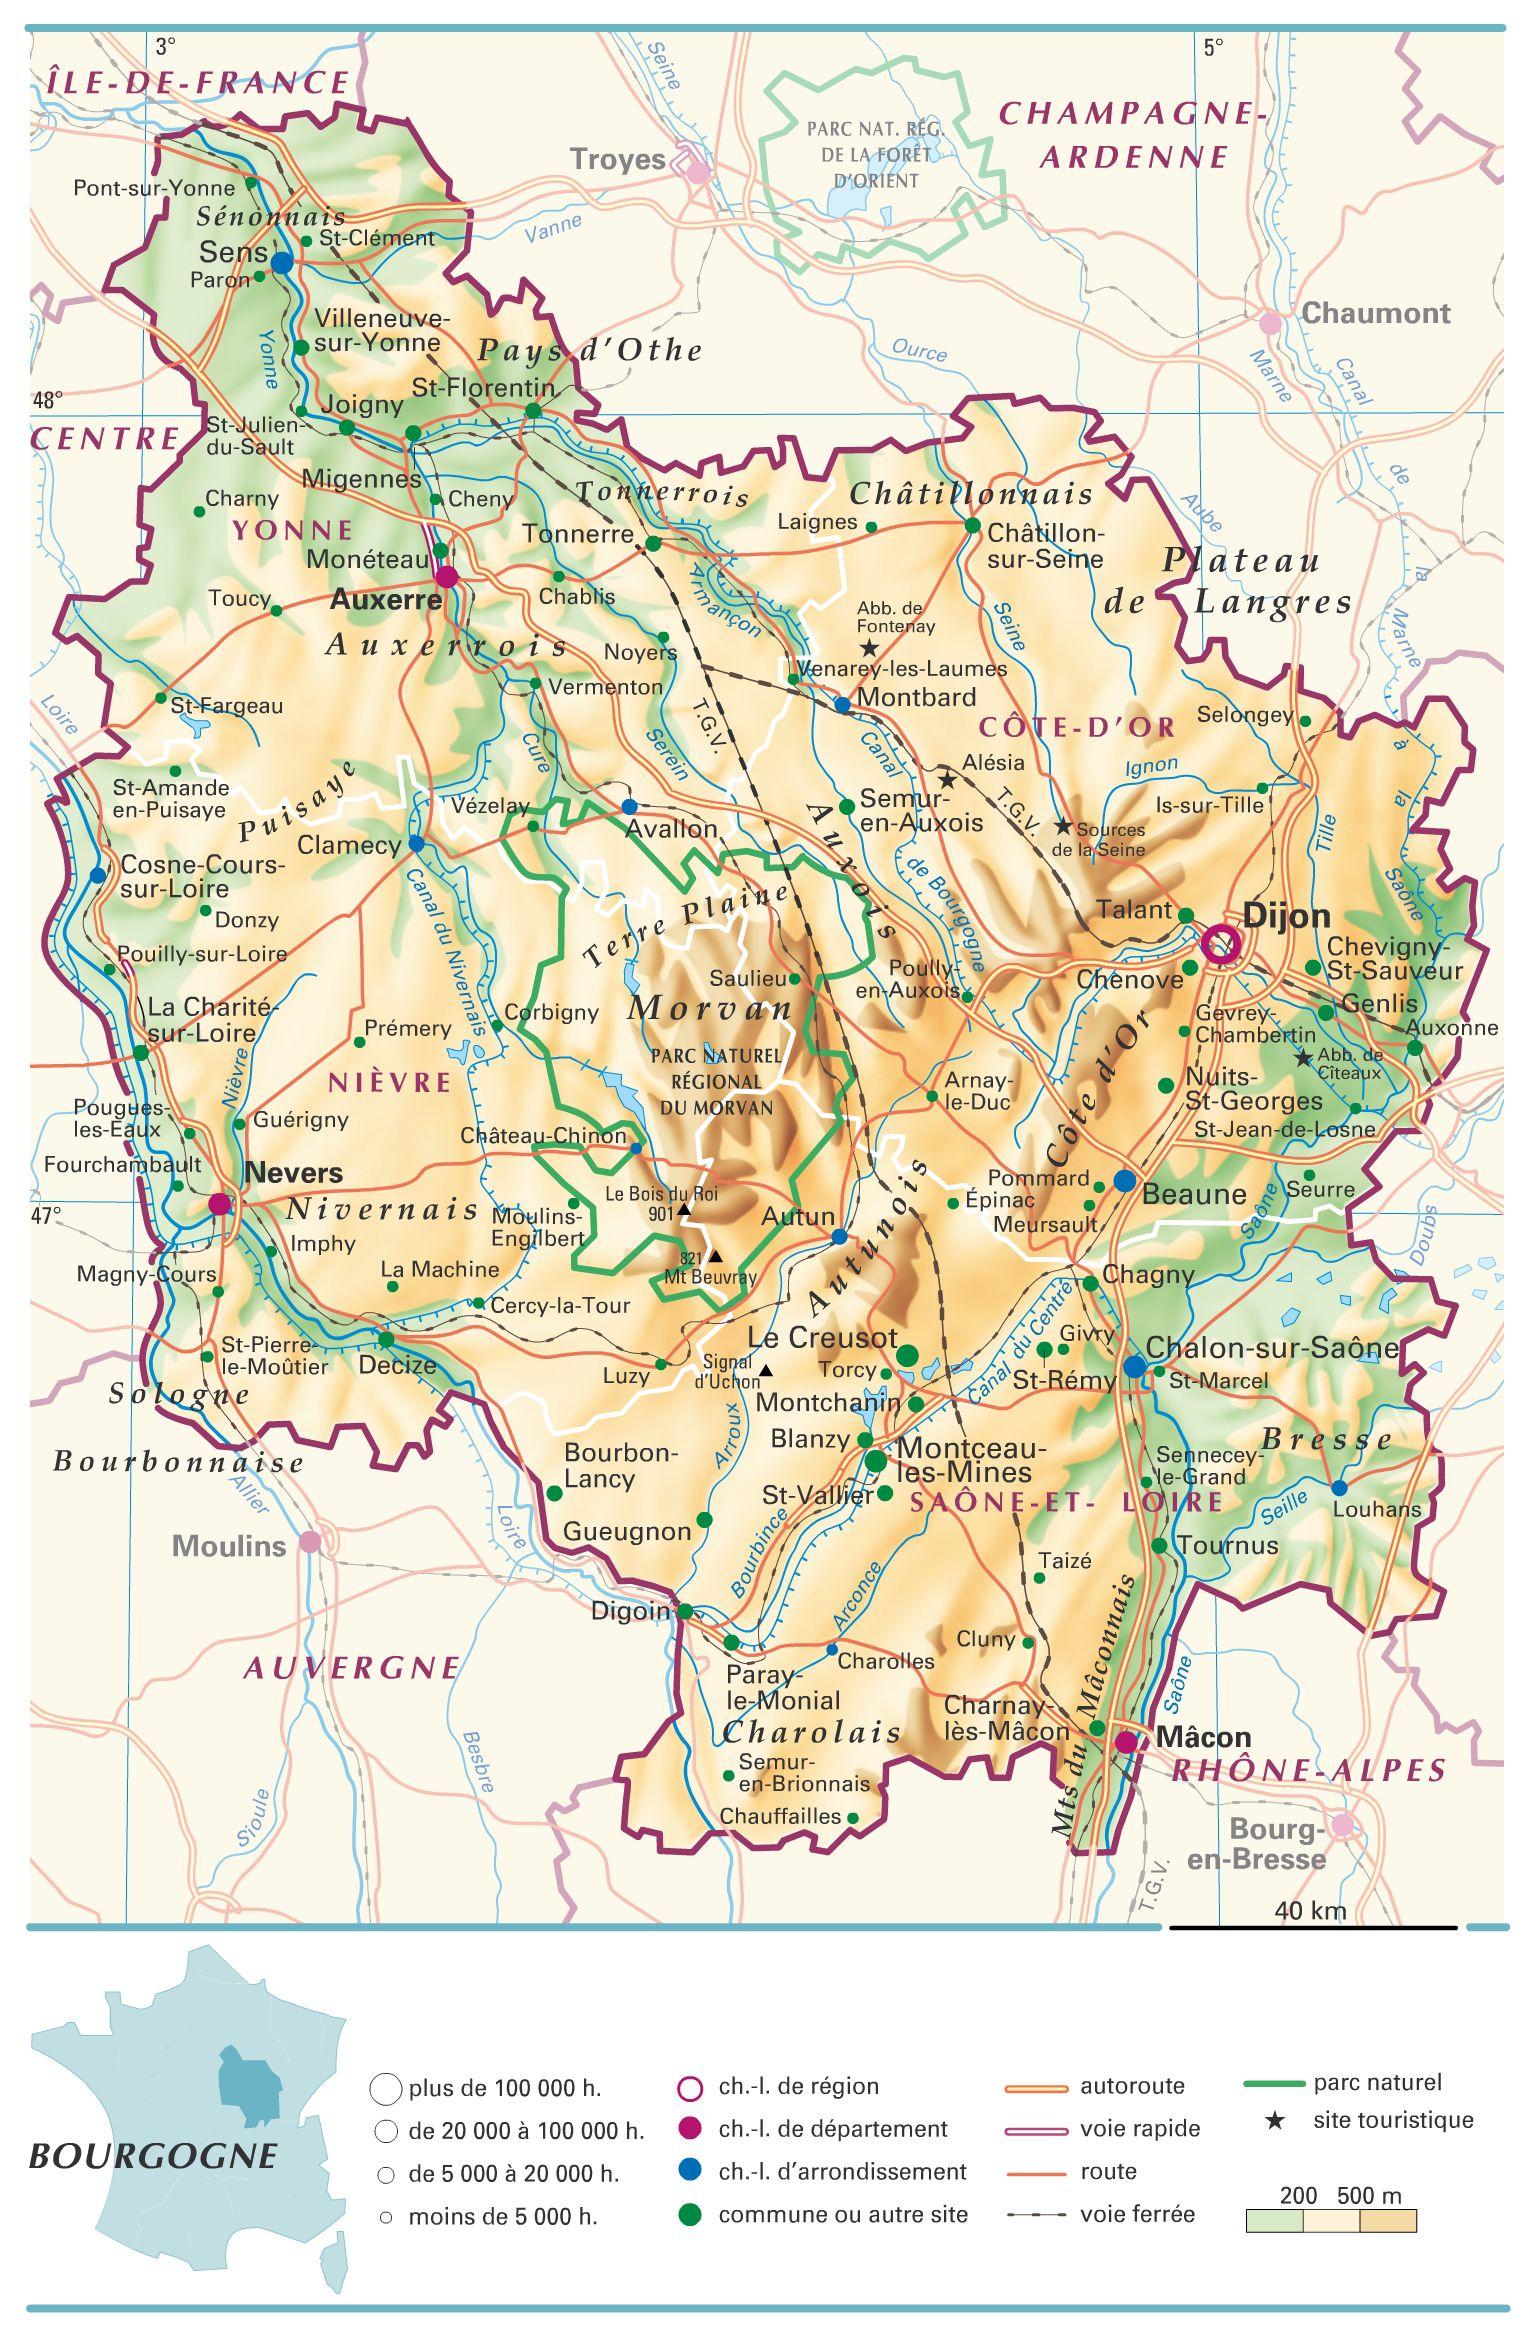 Carte de la Bourgogne